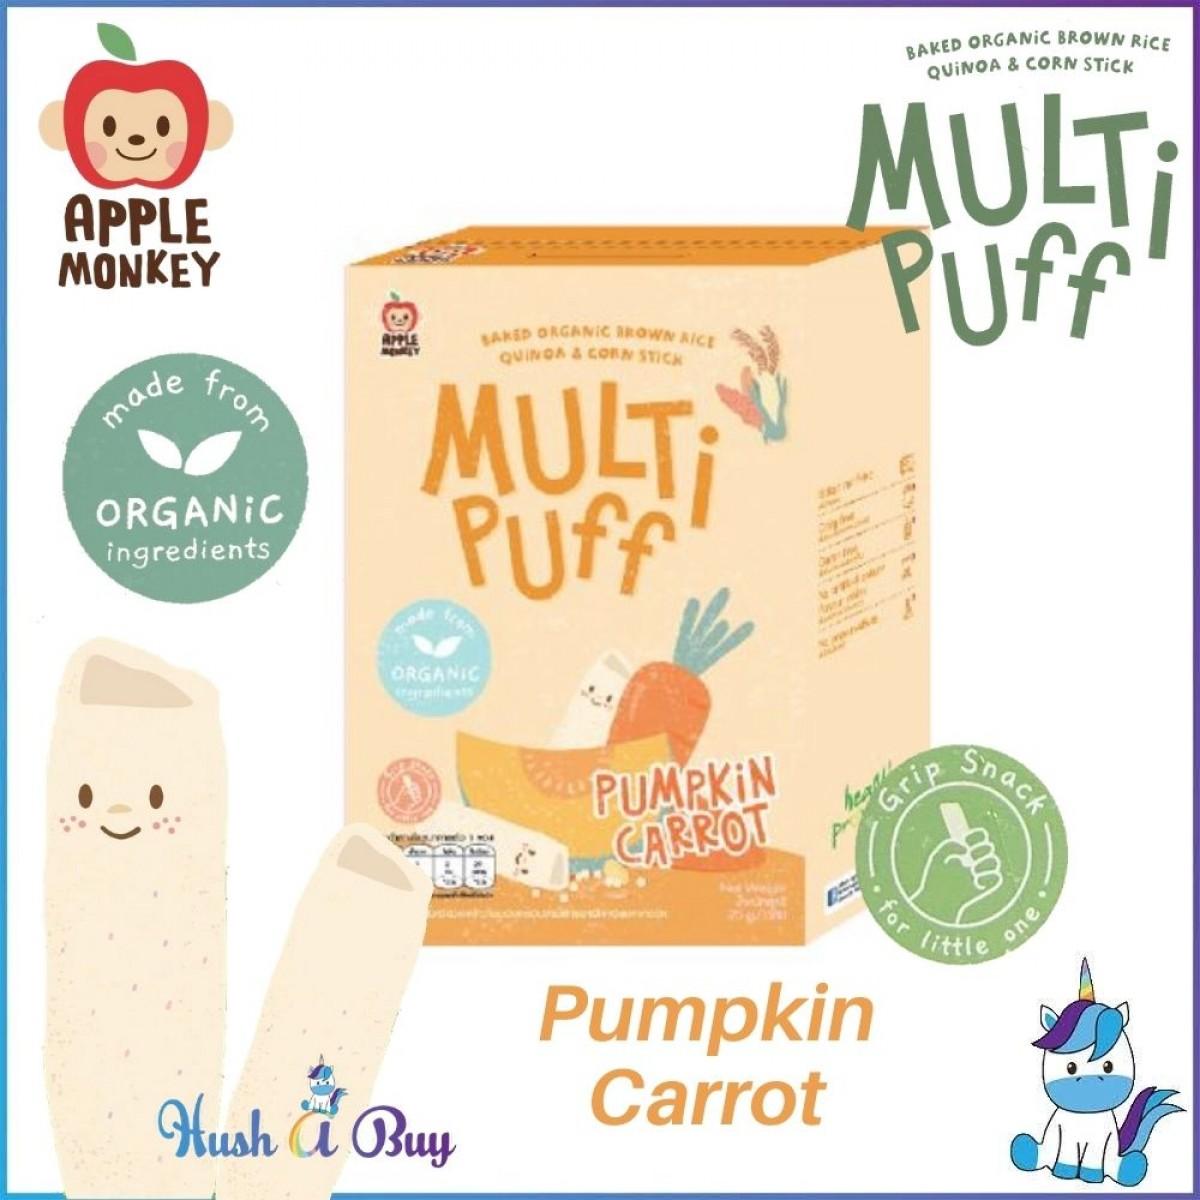 Apple Monkey Organic Multi Puff 25g - Apple Broccoli / Mixed Berry / Pumpkin Carrot *New*